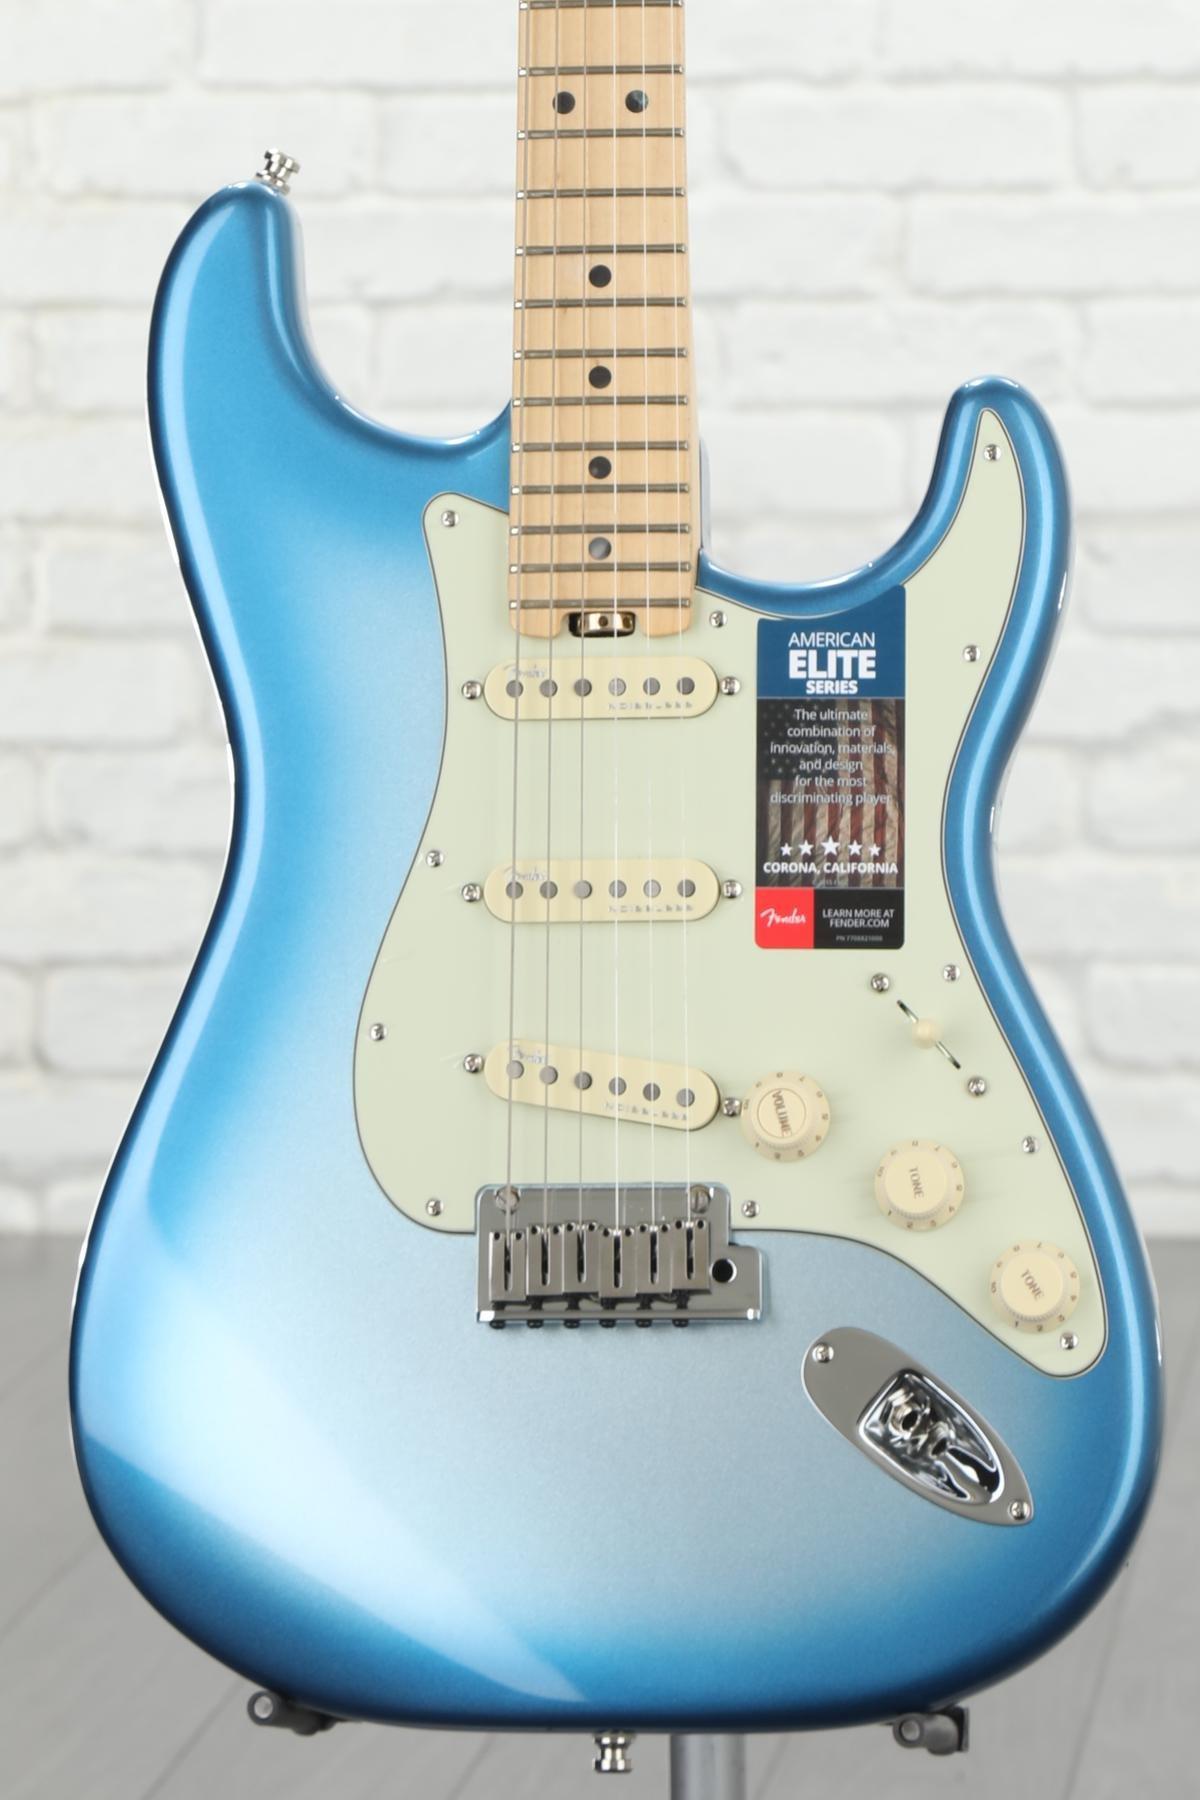 Fender American Elite Stratocaster Sky Burst Metallic W Maple Re Switching Options For P90 Humbucker Combination Fingerboard Image 1